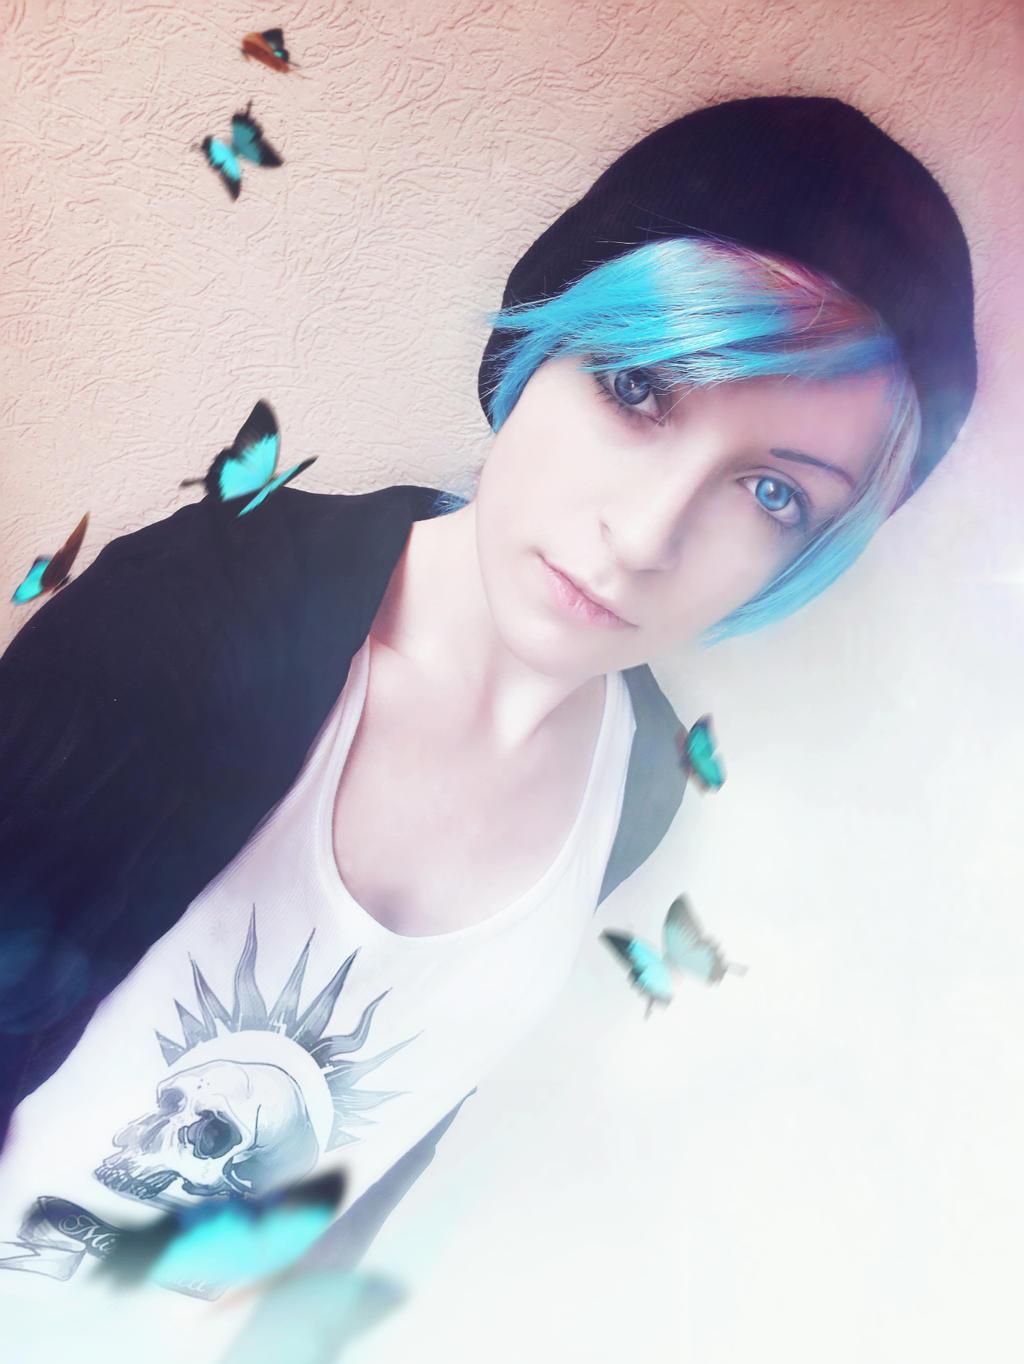 Chloe Price - Life is strange Cosplay (TEST)2 by AlicexLiddell